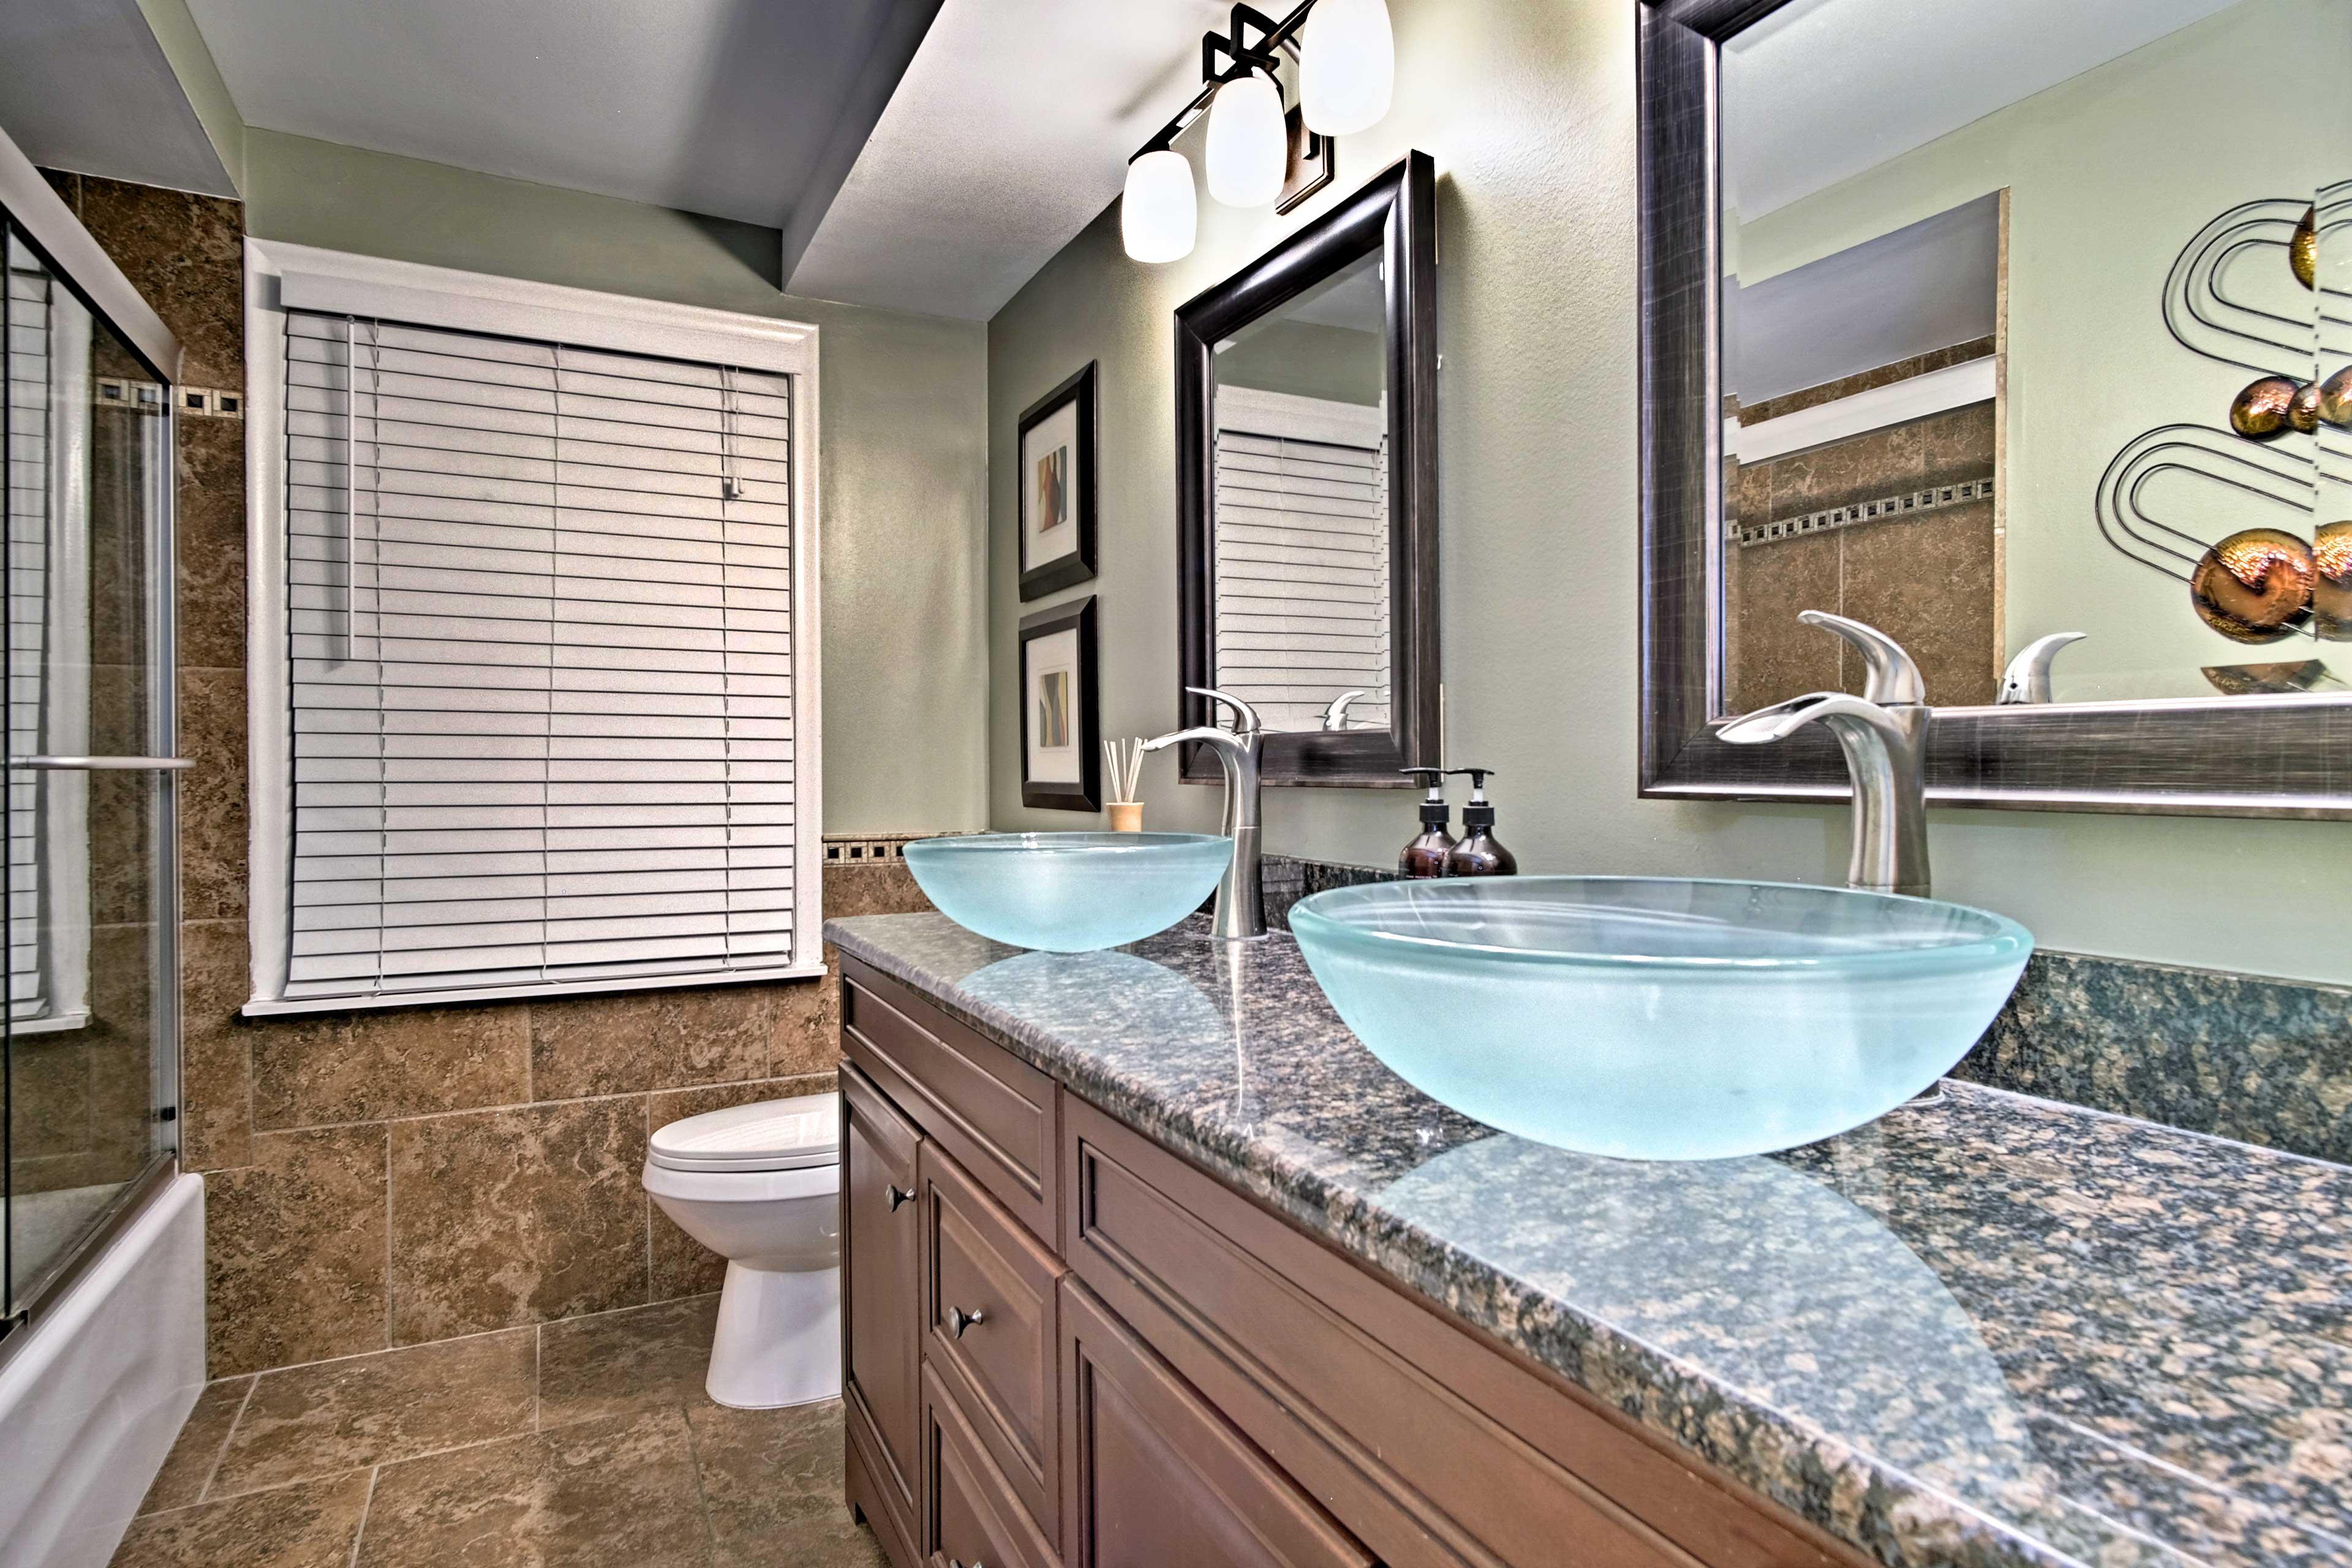 This bathroom boasts Jack-and-Jill sinks!